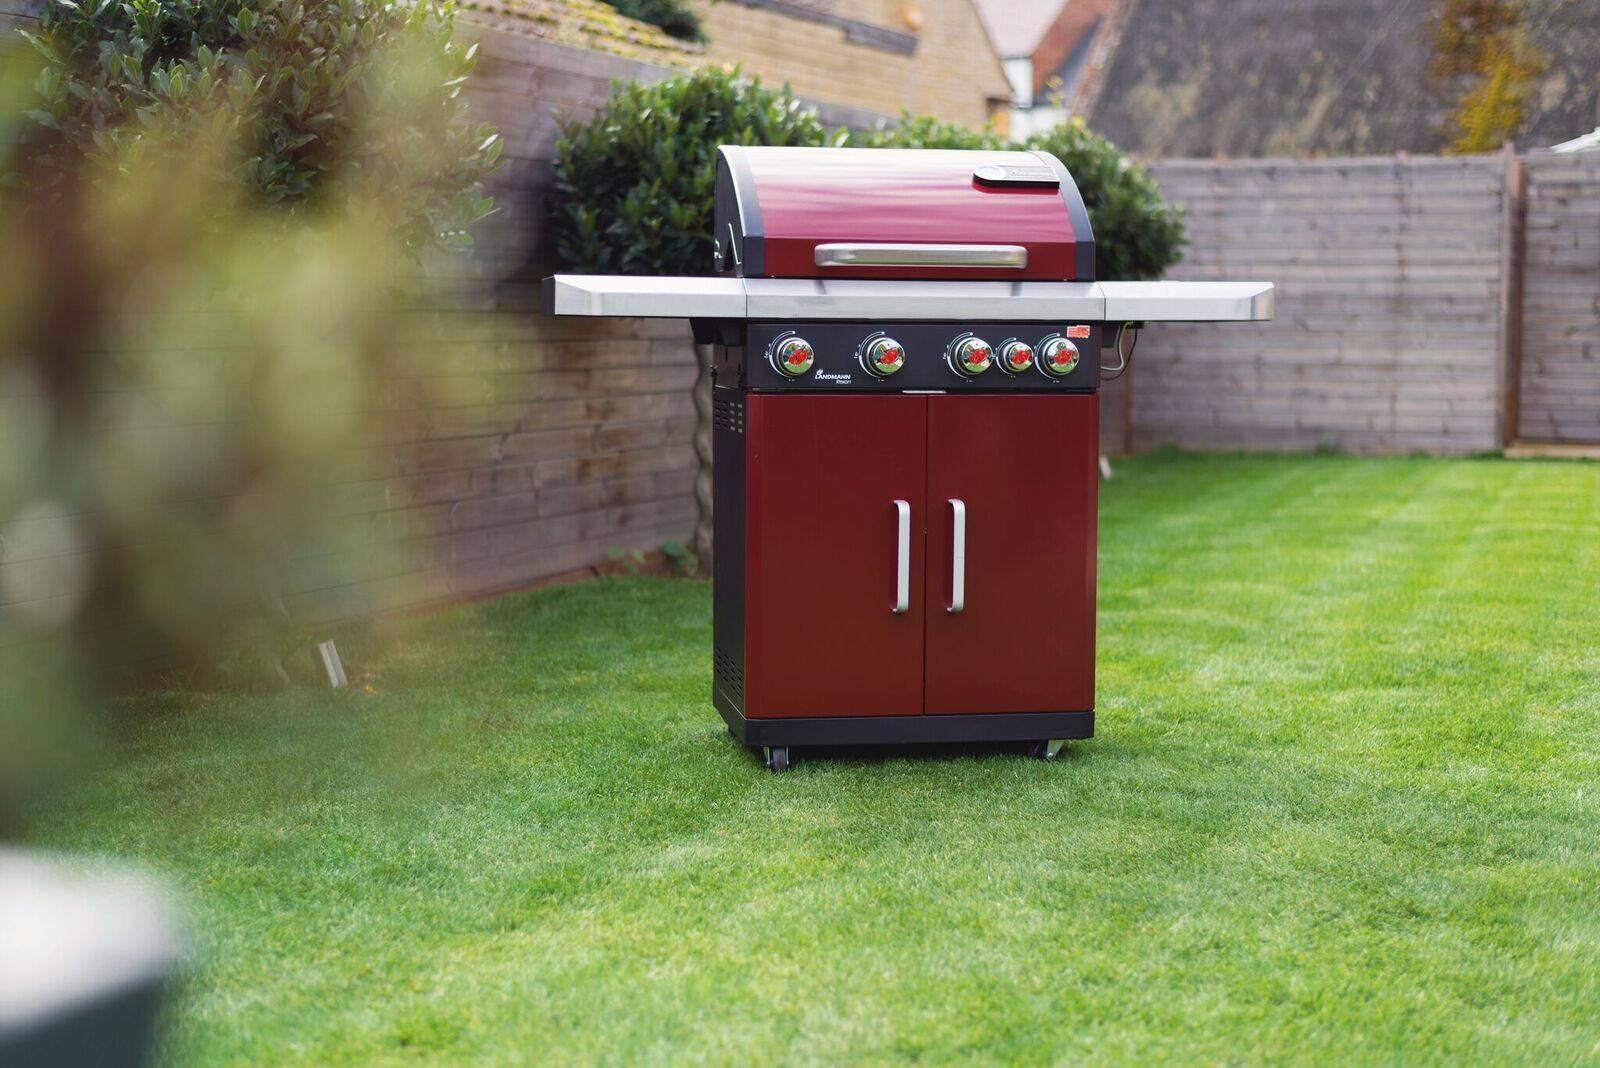 Landmann Holzkohlegrill Black Taurus 660 Test : Grill landmann barbecue in all